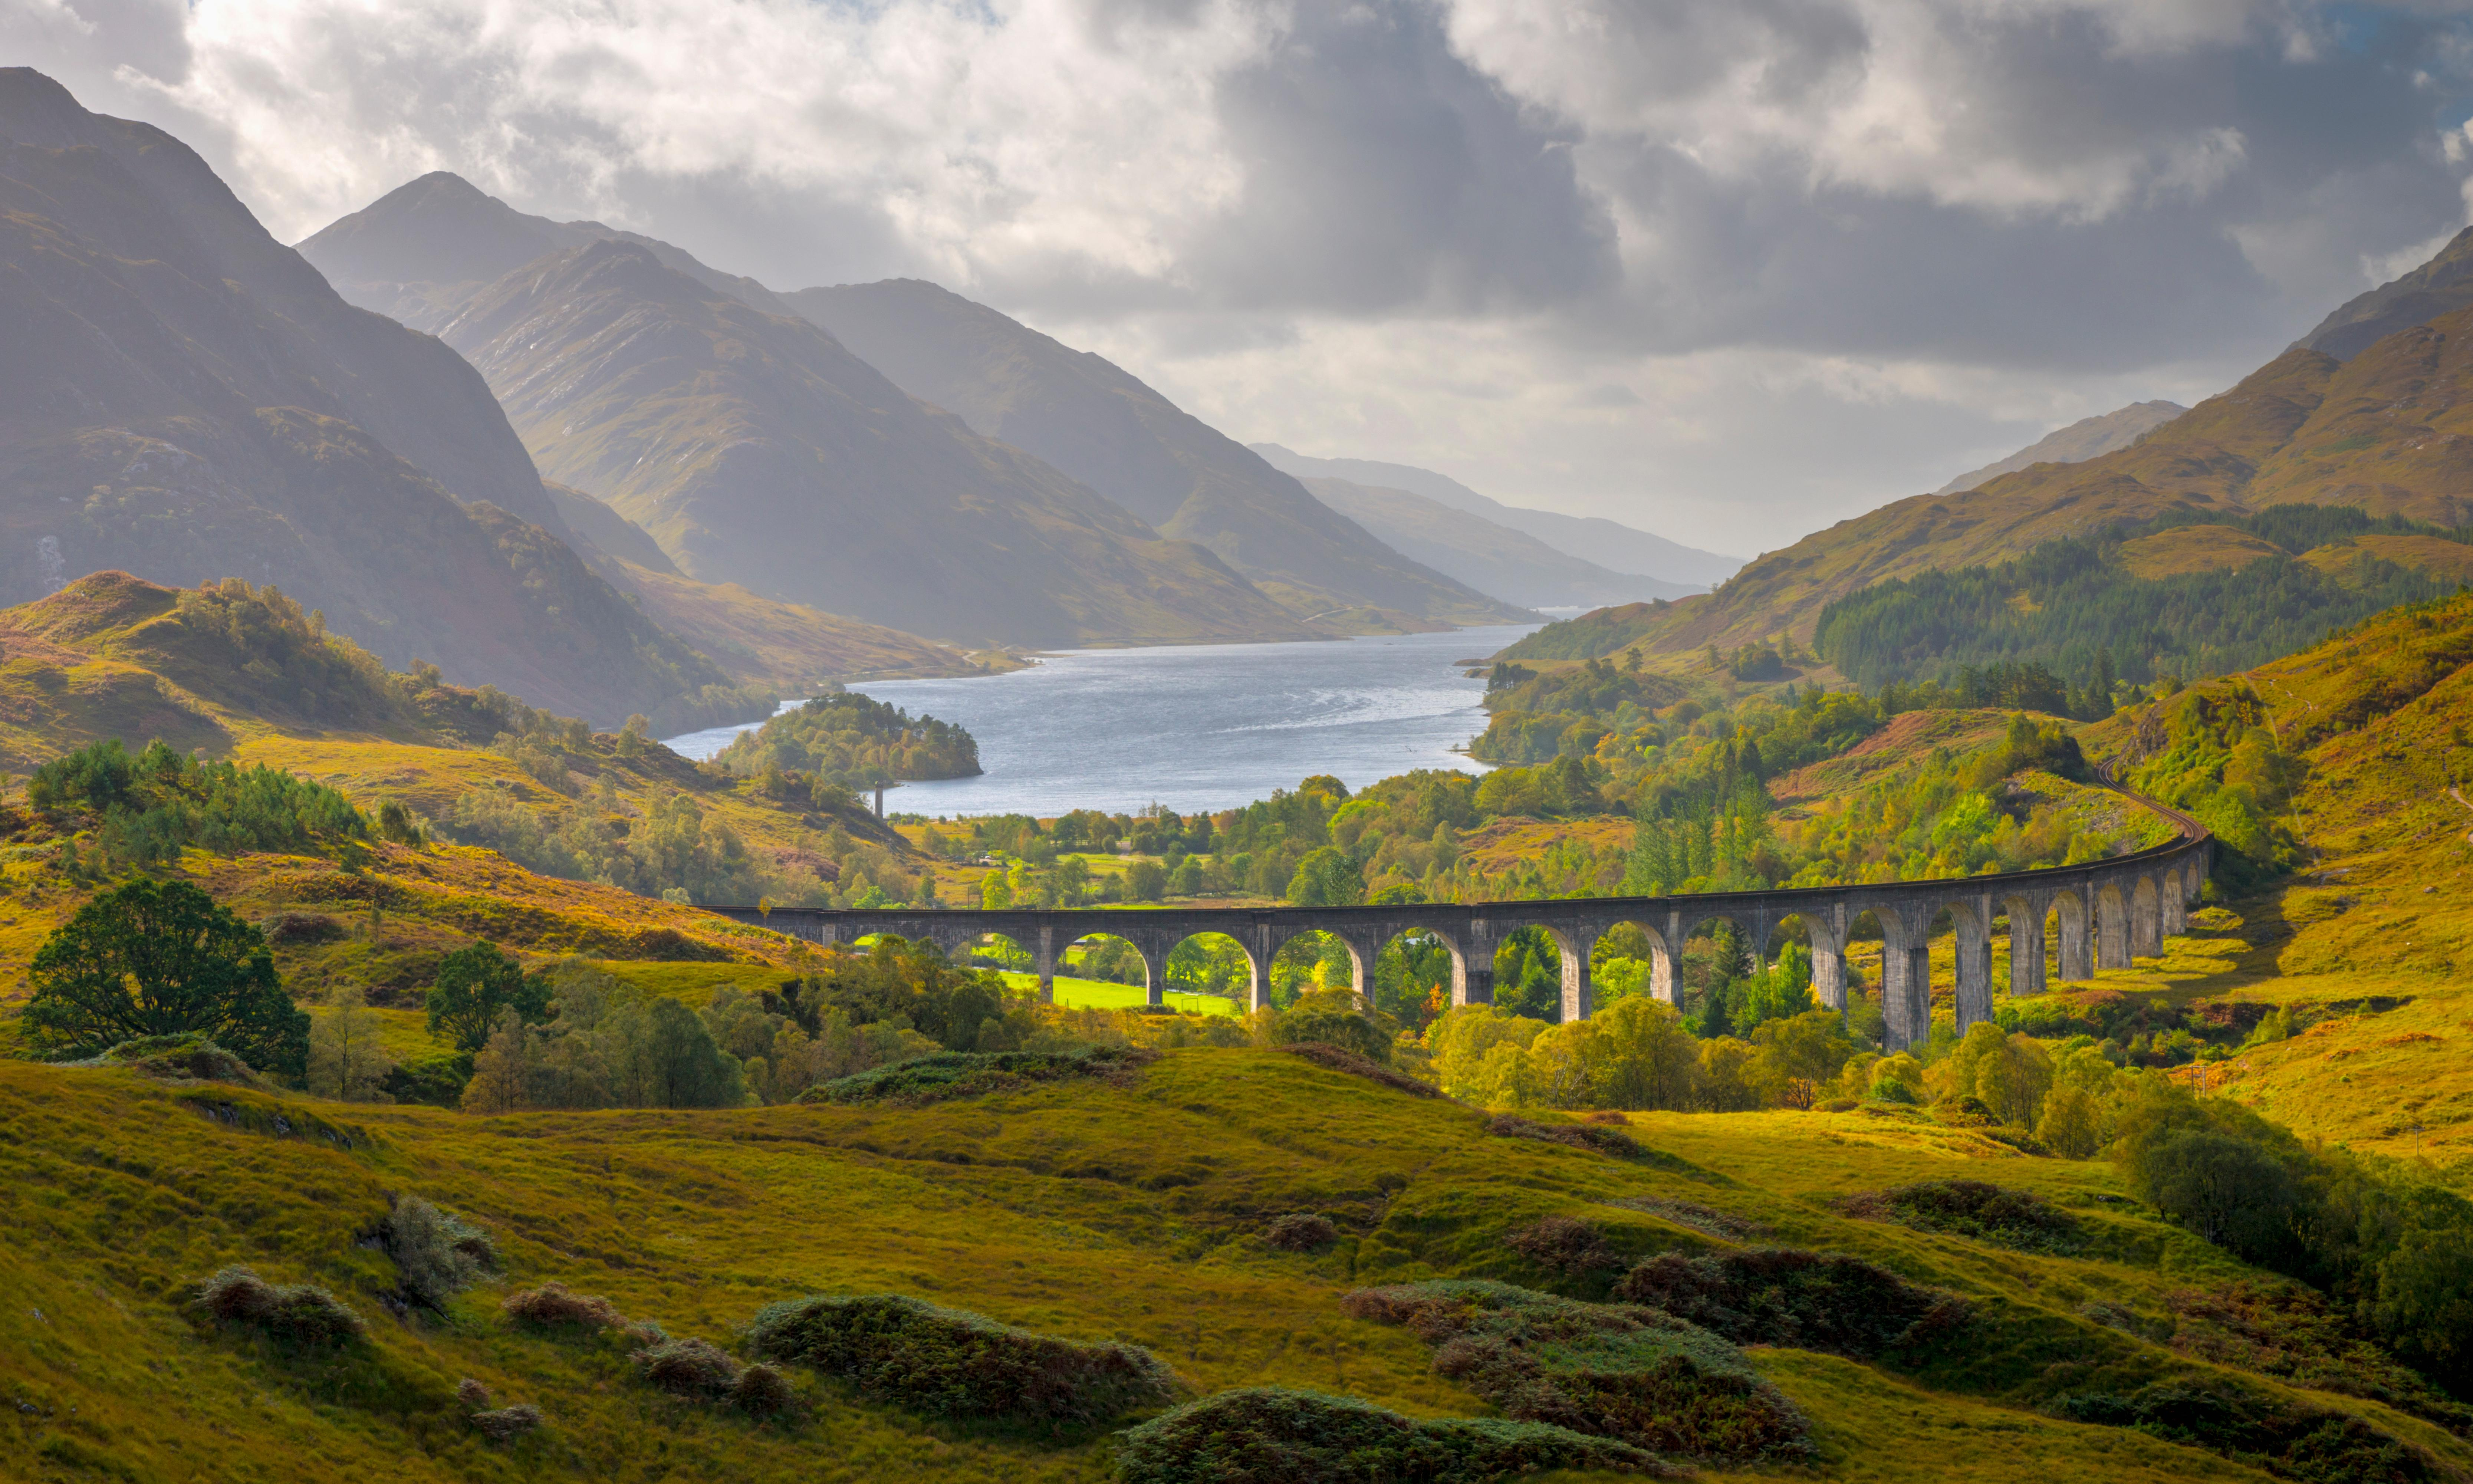 18 of the world's best rail journeys